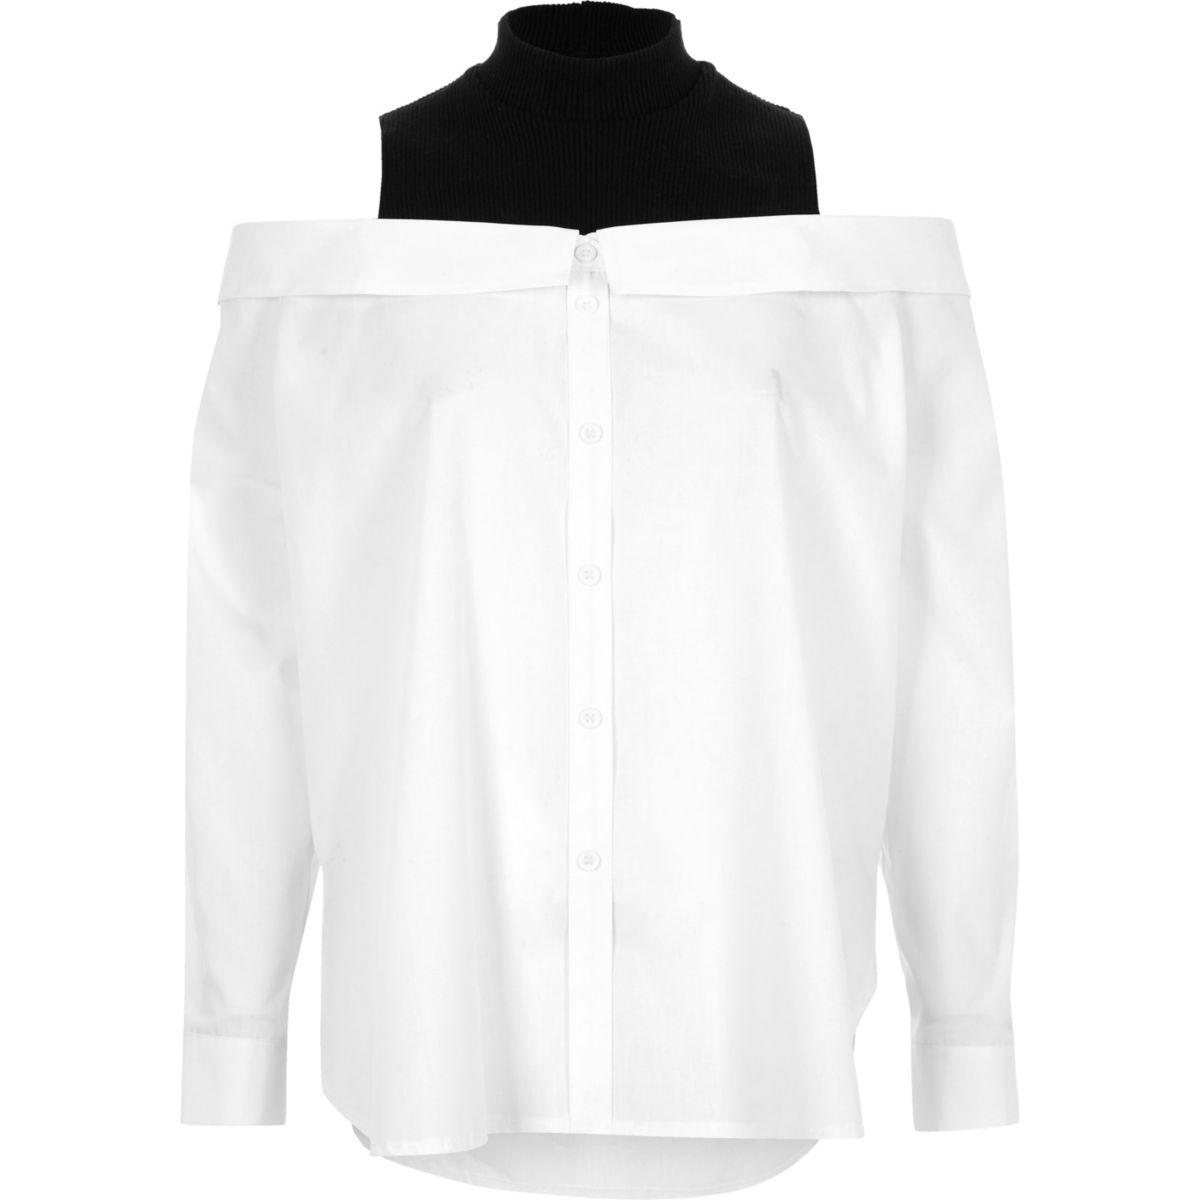 White turtle neck layered bardot shirt